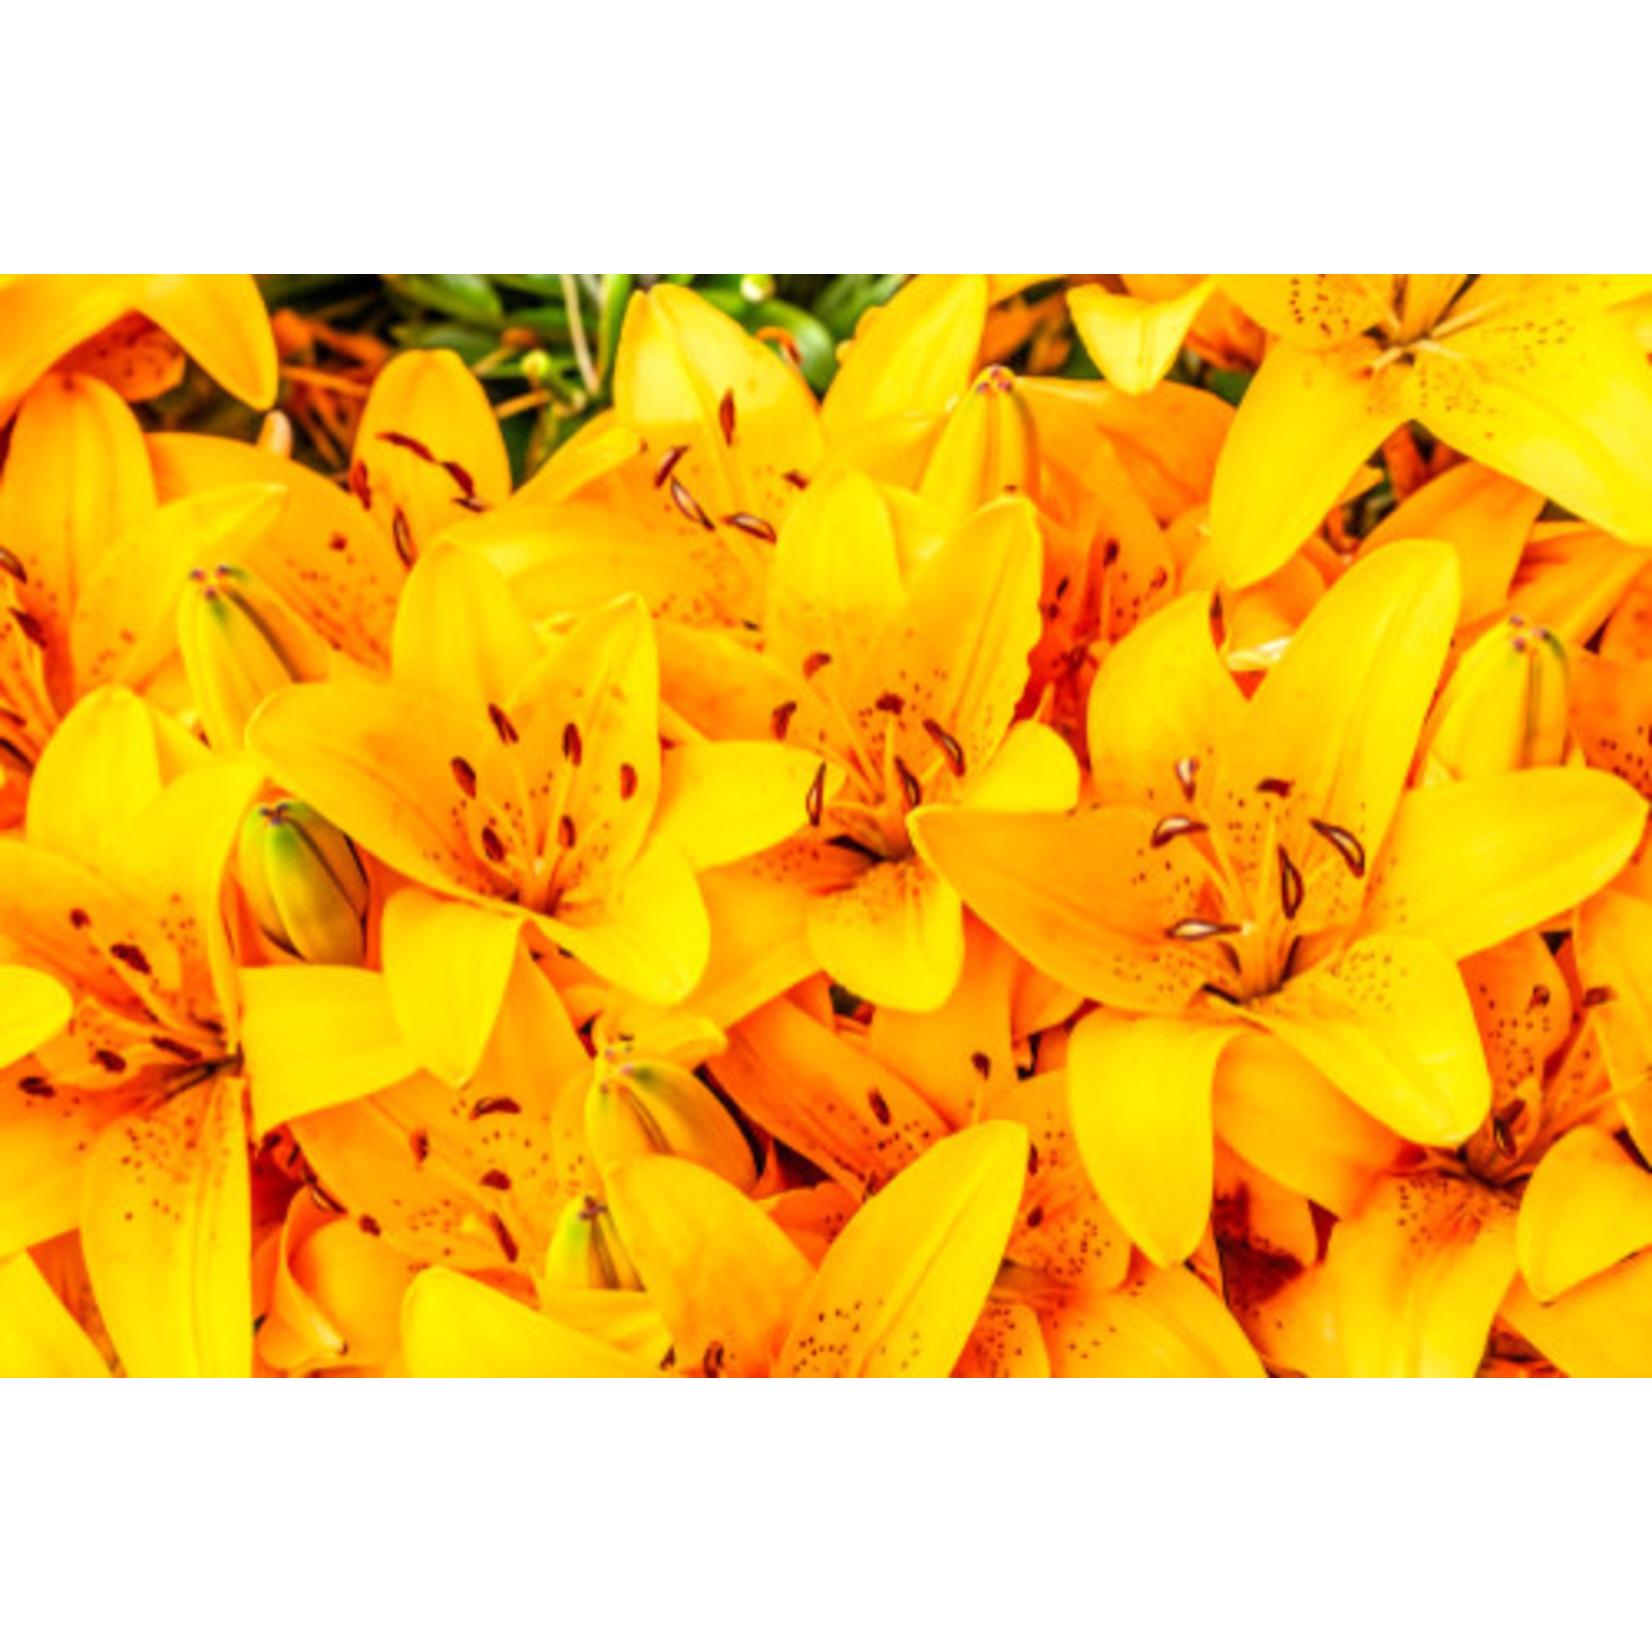 Asiatic Lily 'Golden Matrix' - 1 gal